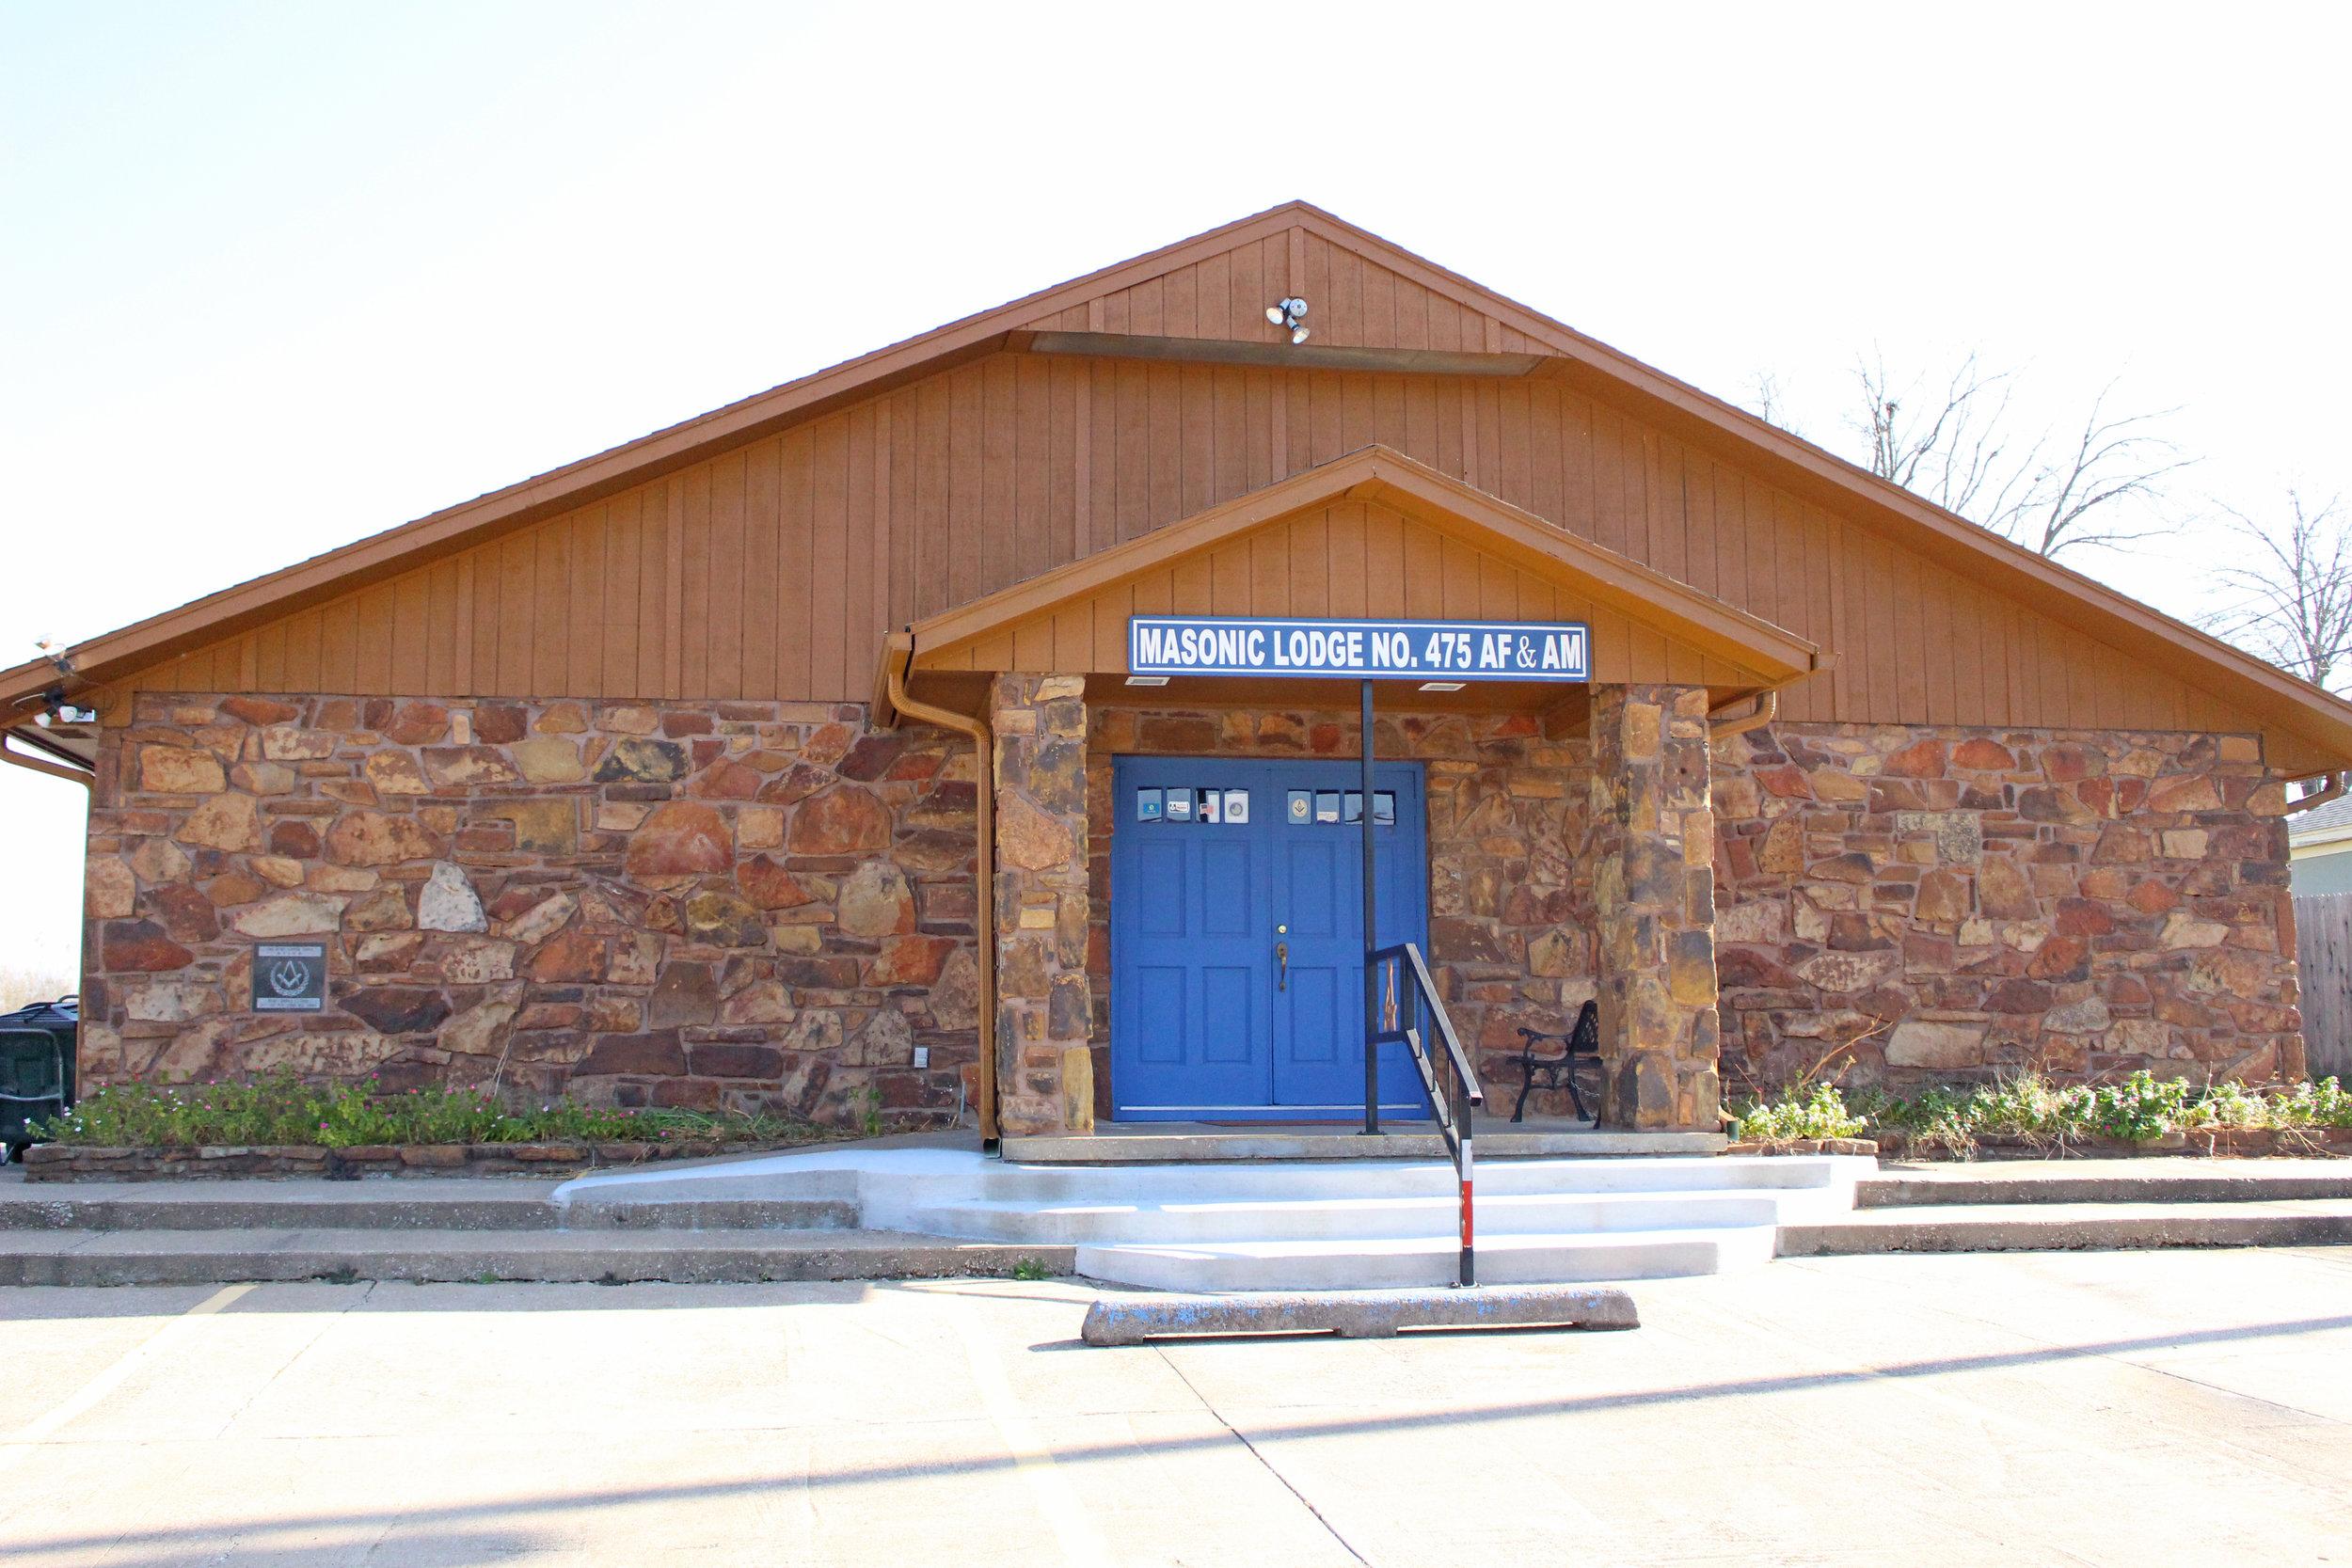 masonic lodge 475 - prattville 3201 south 113th west avenue